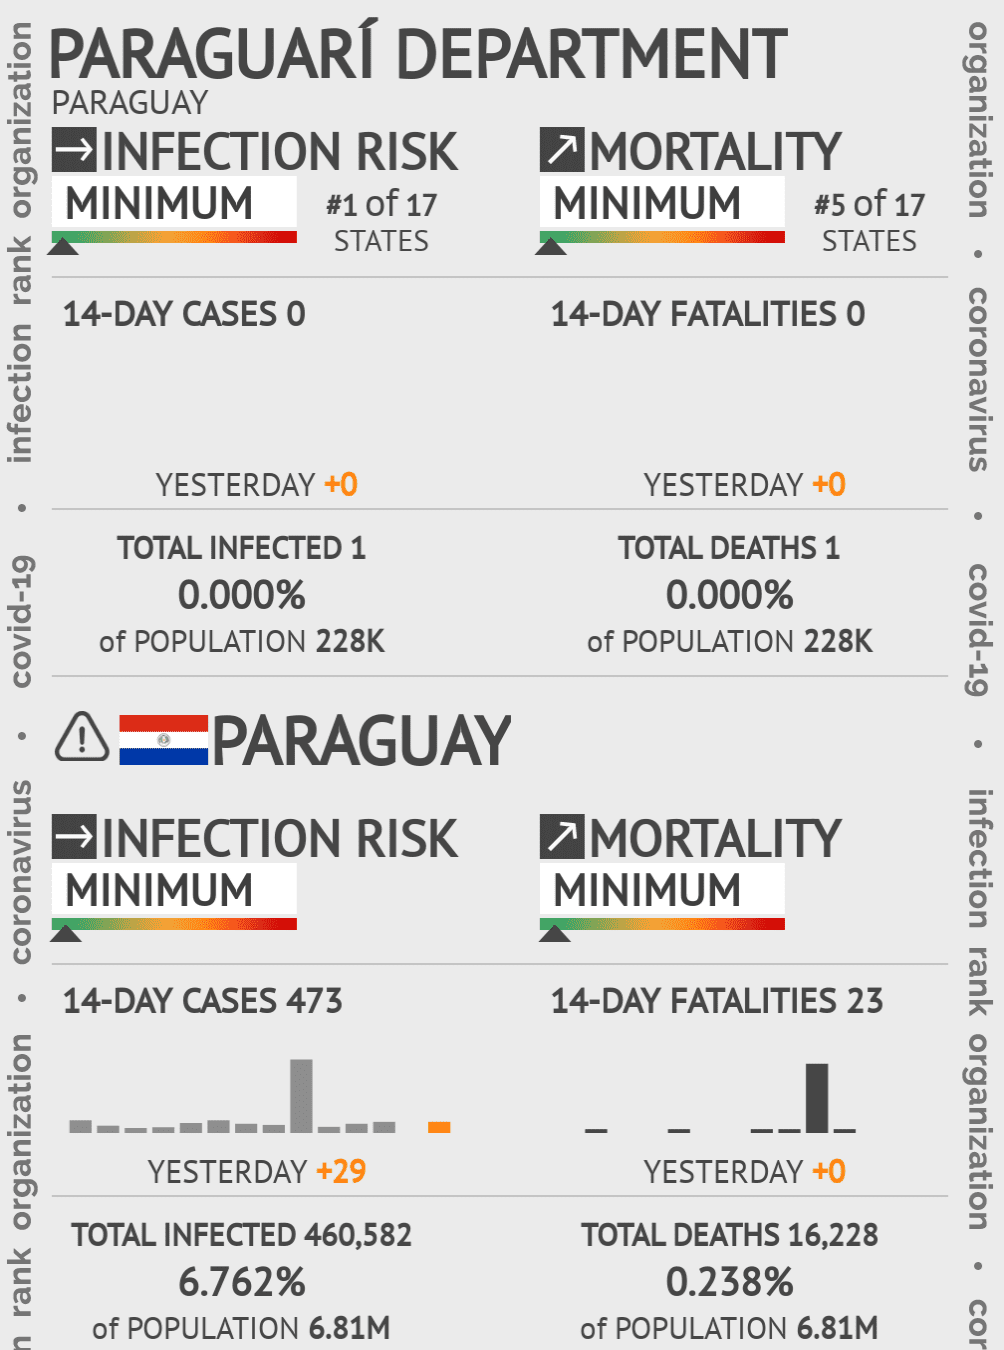 Paraguarí Coronavirus Covid-19 Risk of Infection on December 11, 2020